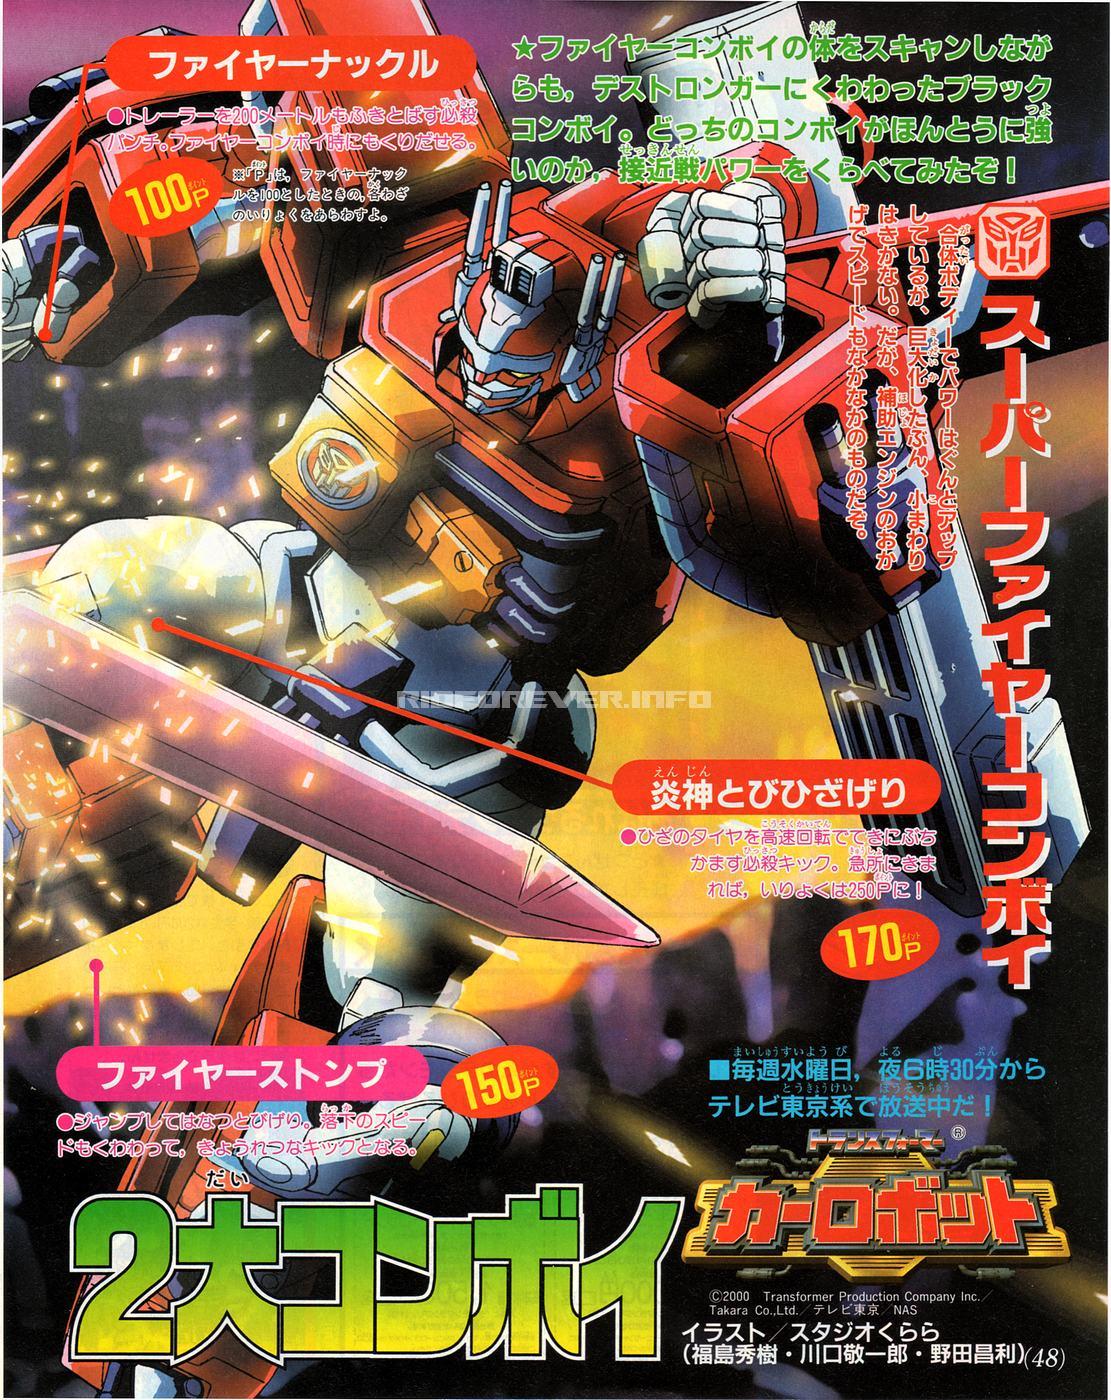 TV Magazine 2000-08-8-1